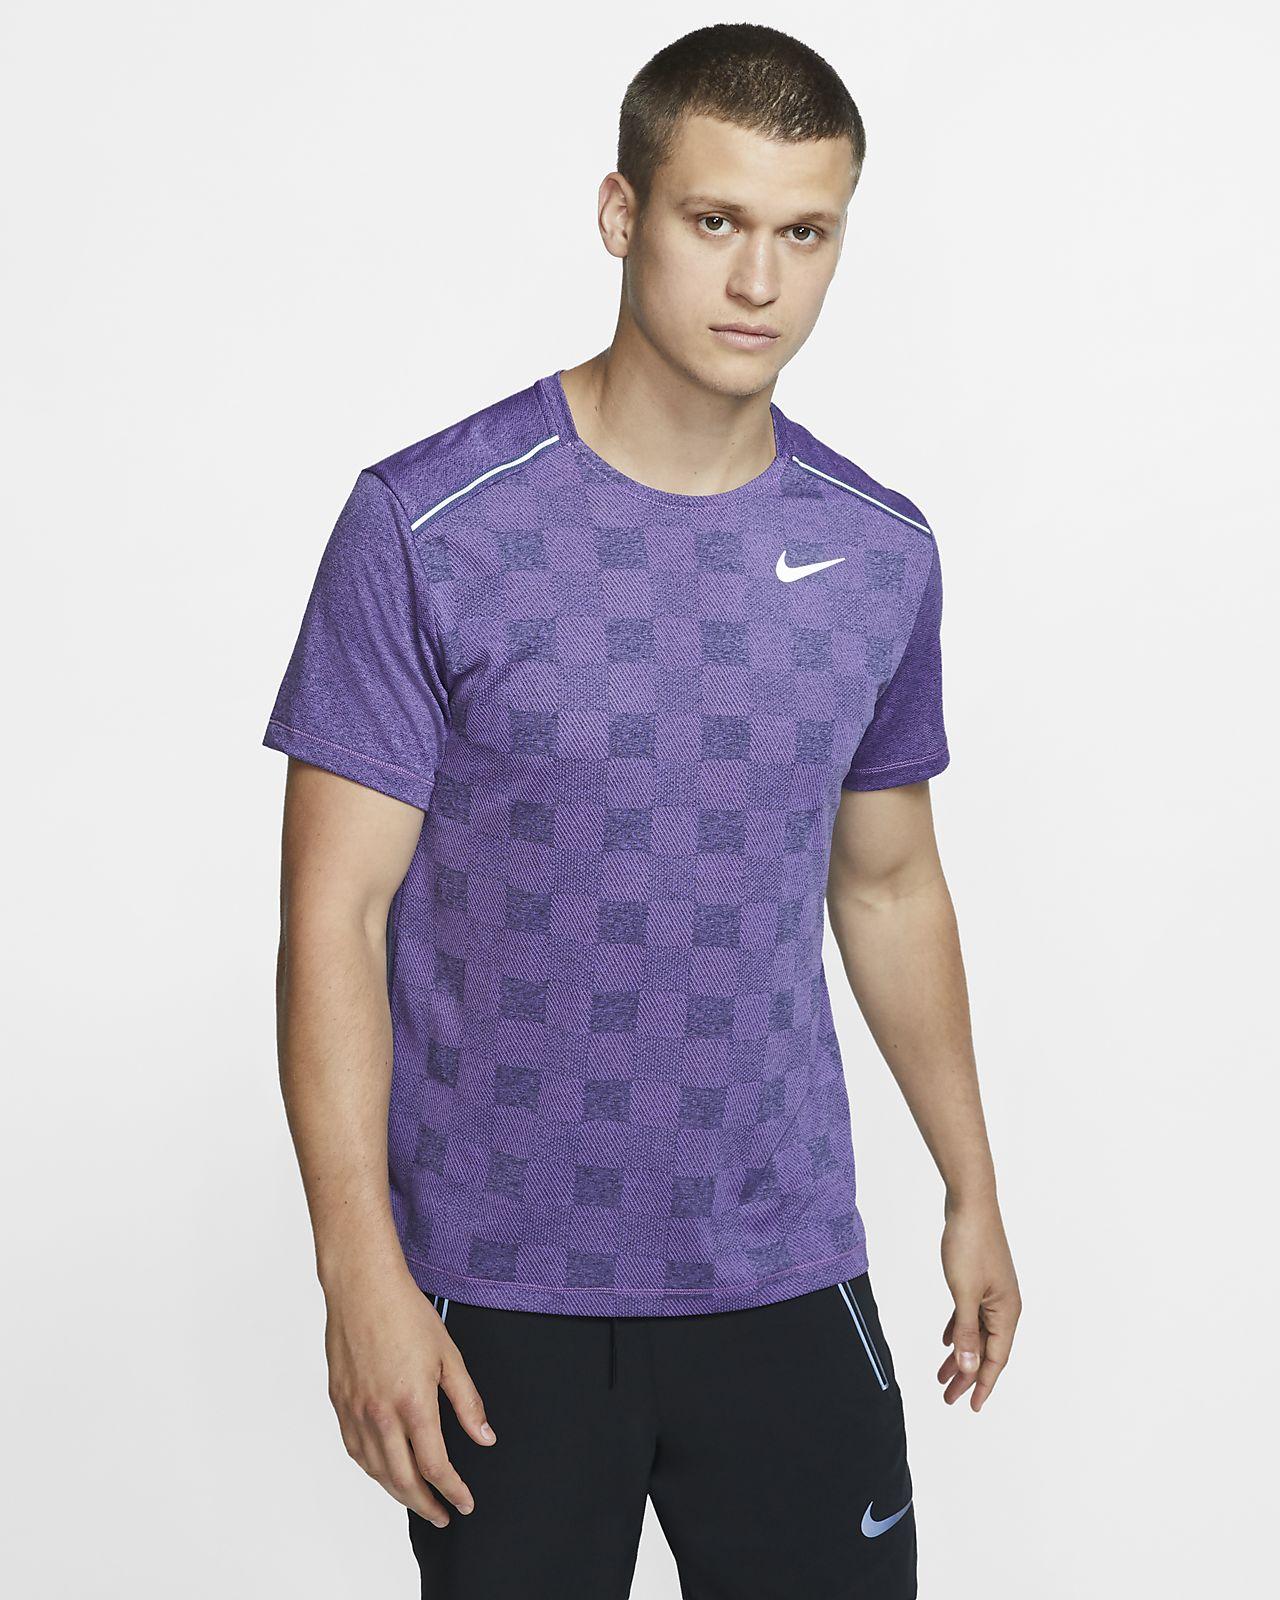 Nike Dri-FIT Miler Men's Short-Sleeve Knit Running Top